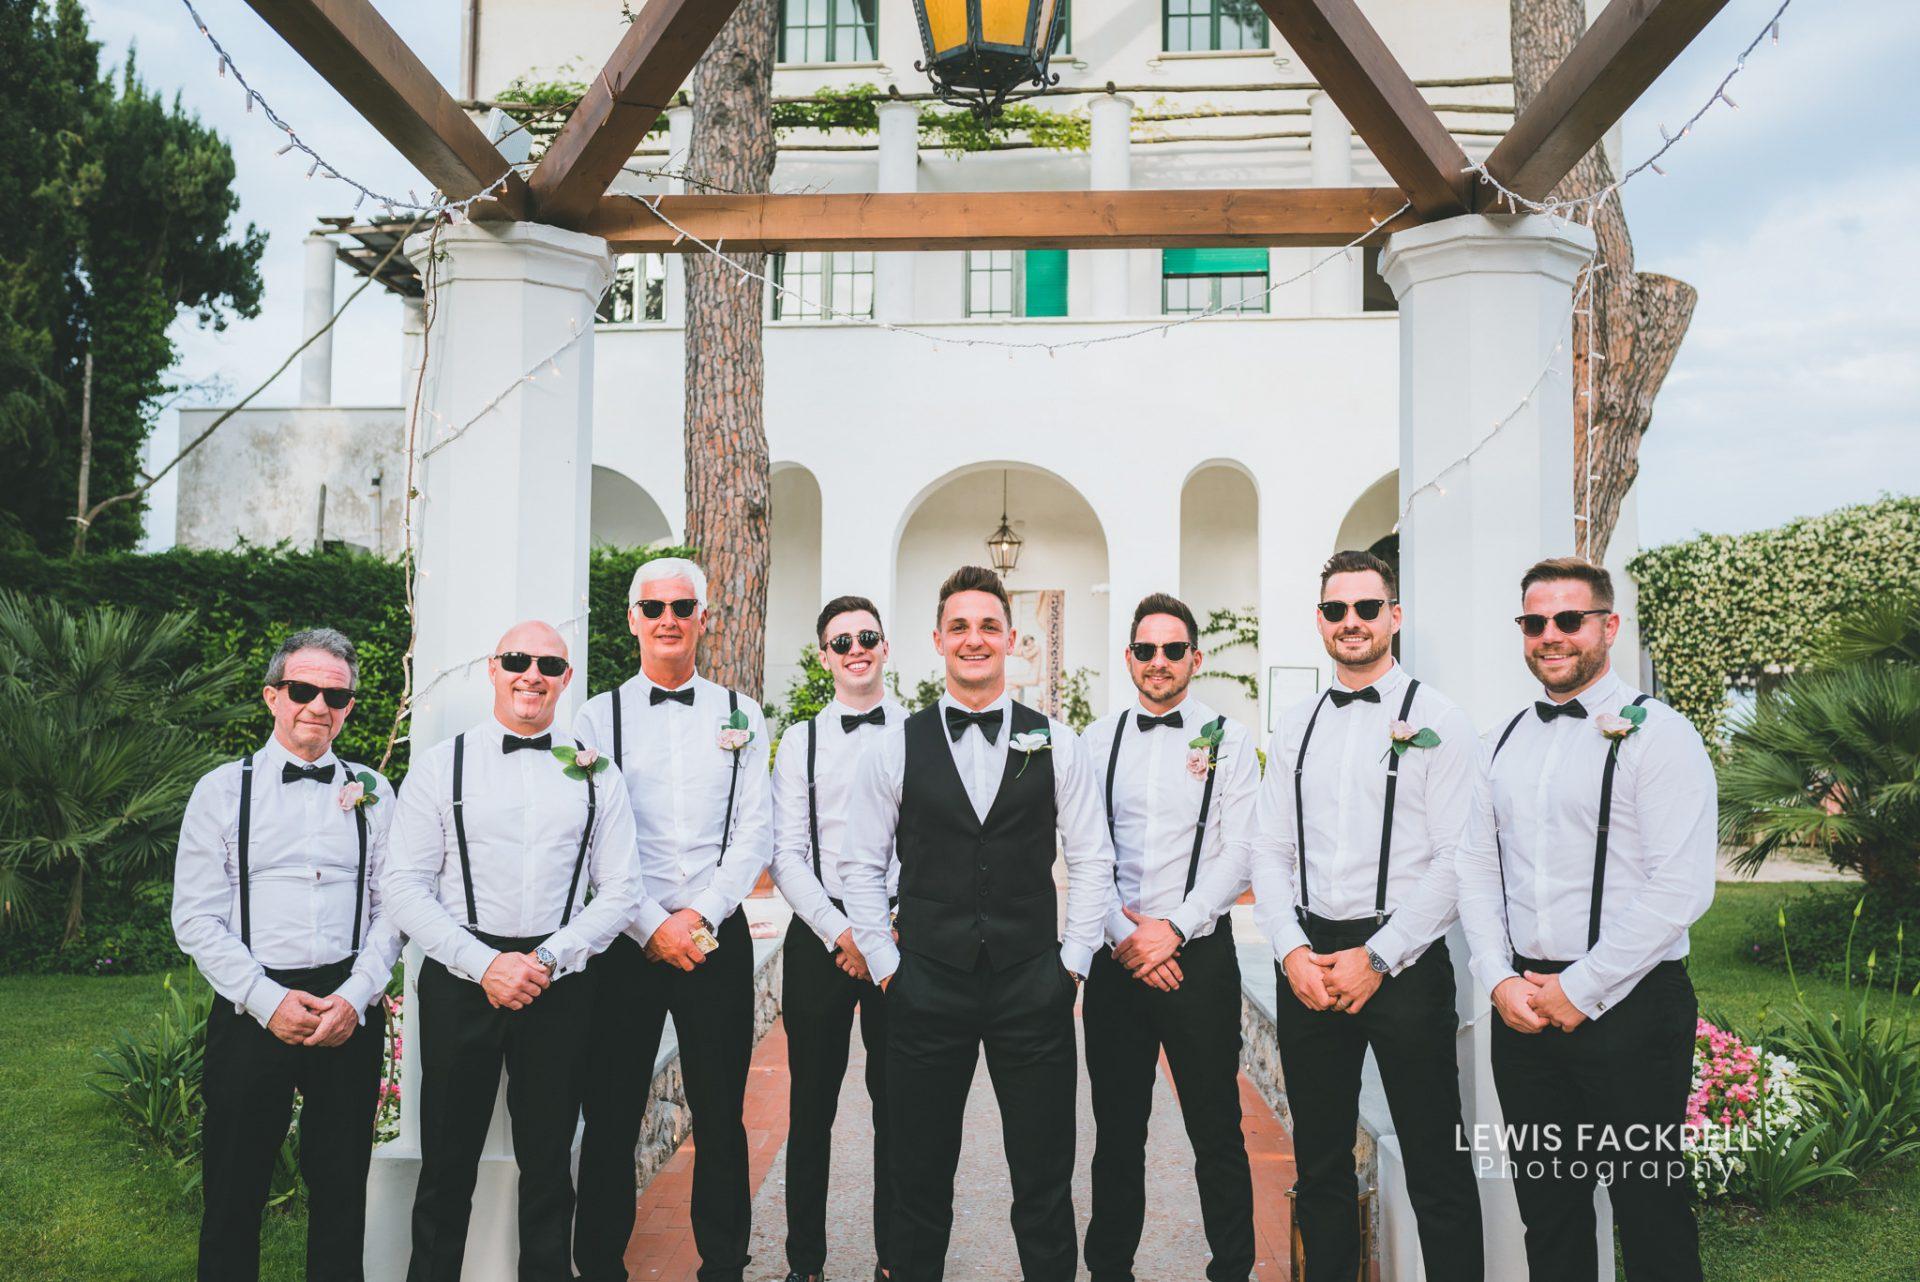 Wedding formal group photos at a wedding in Ravello, Italy